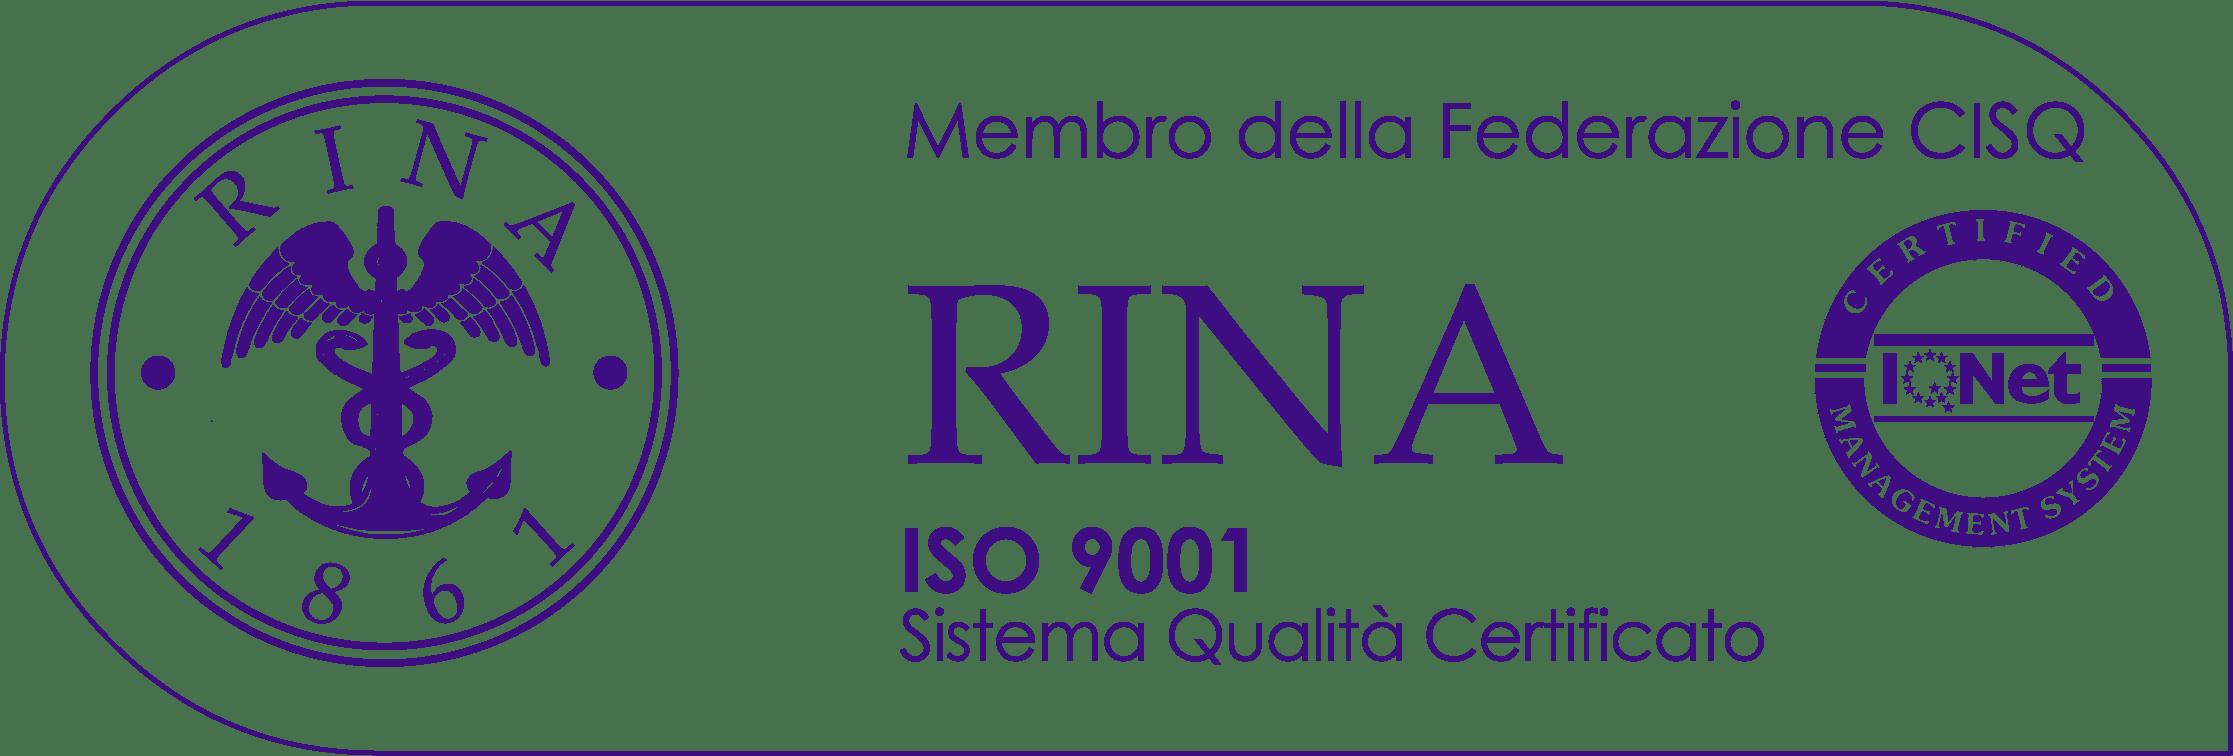 rina bizmatica